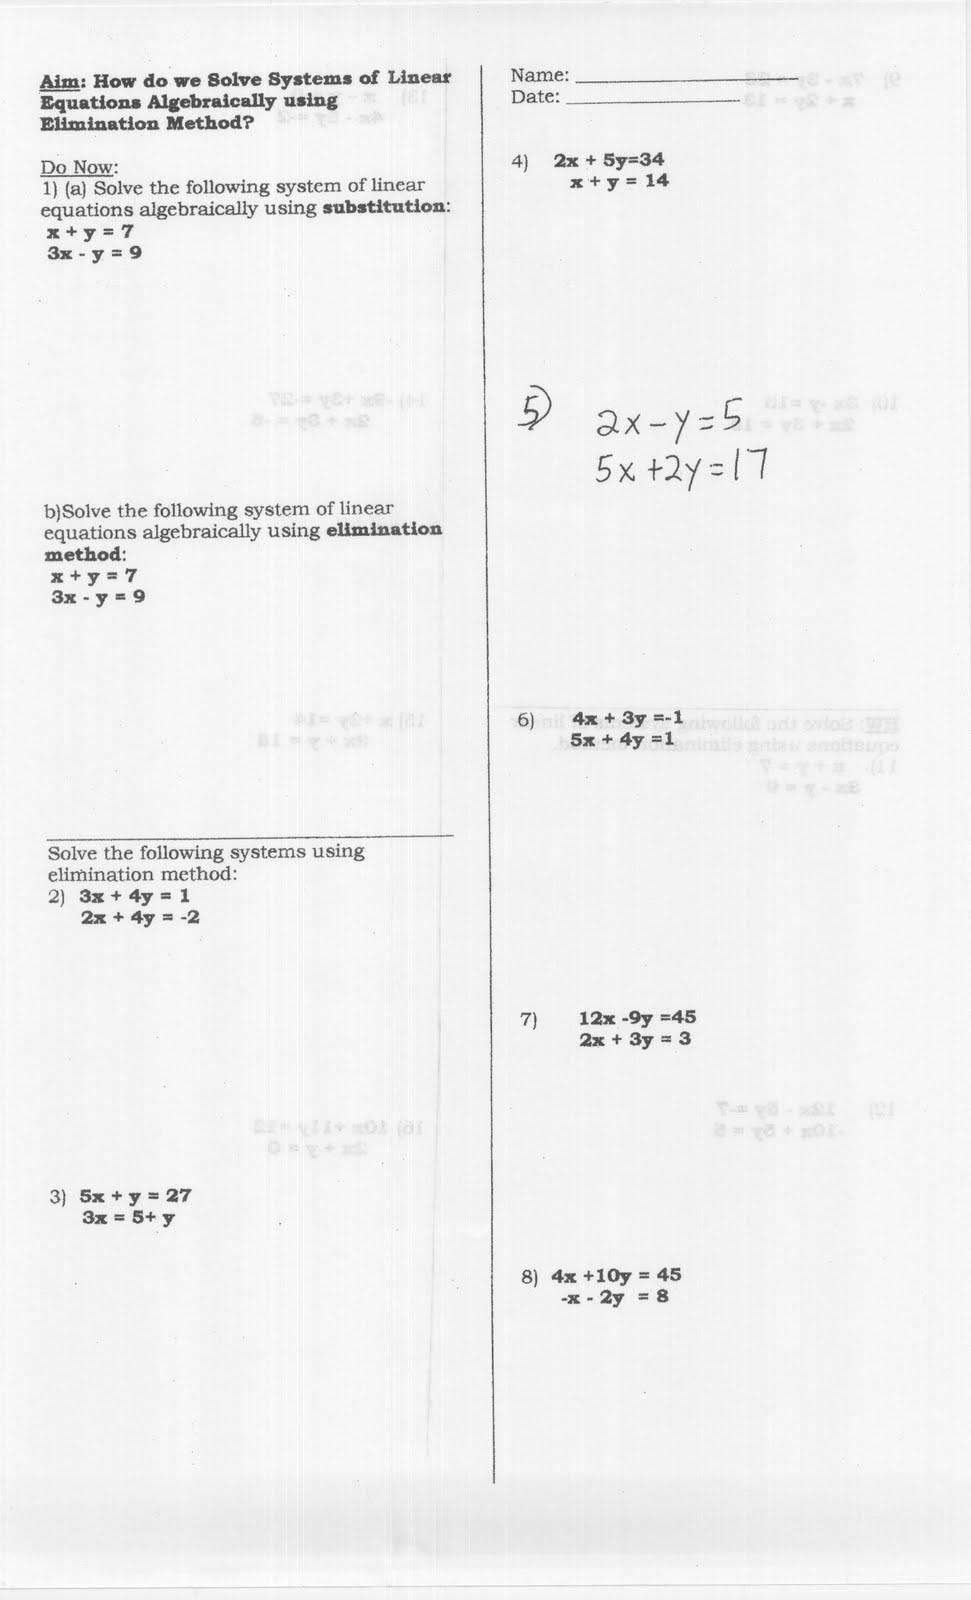 Mr. Napoli's Algebra: Aim: How do we solve a system of